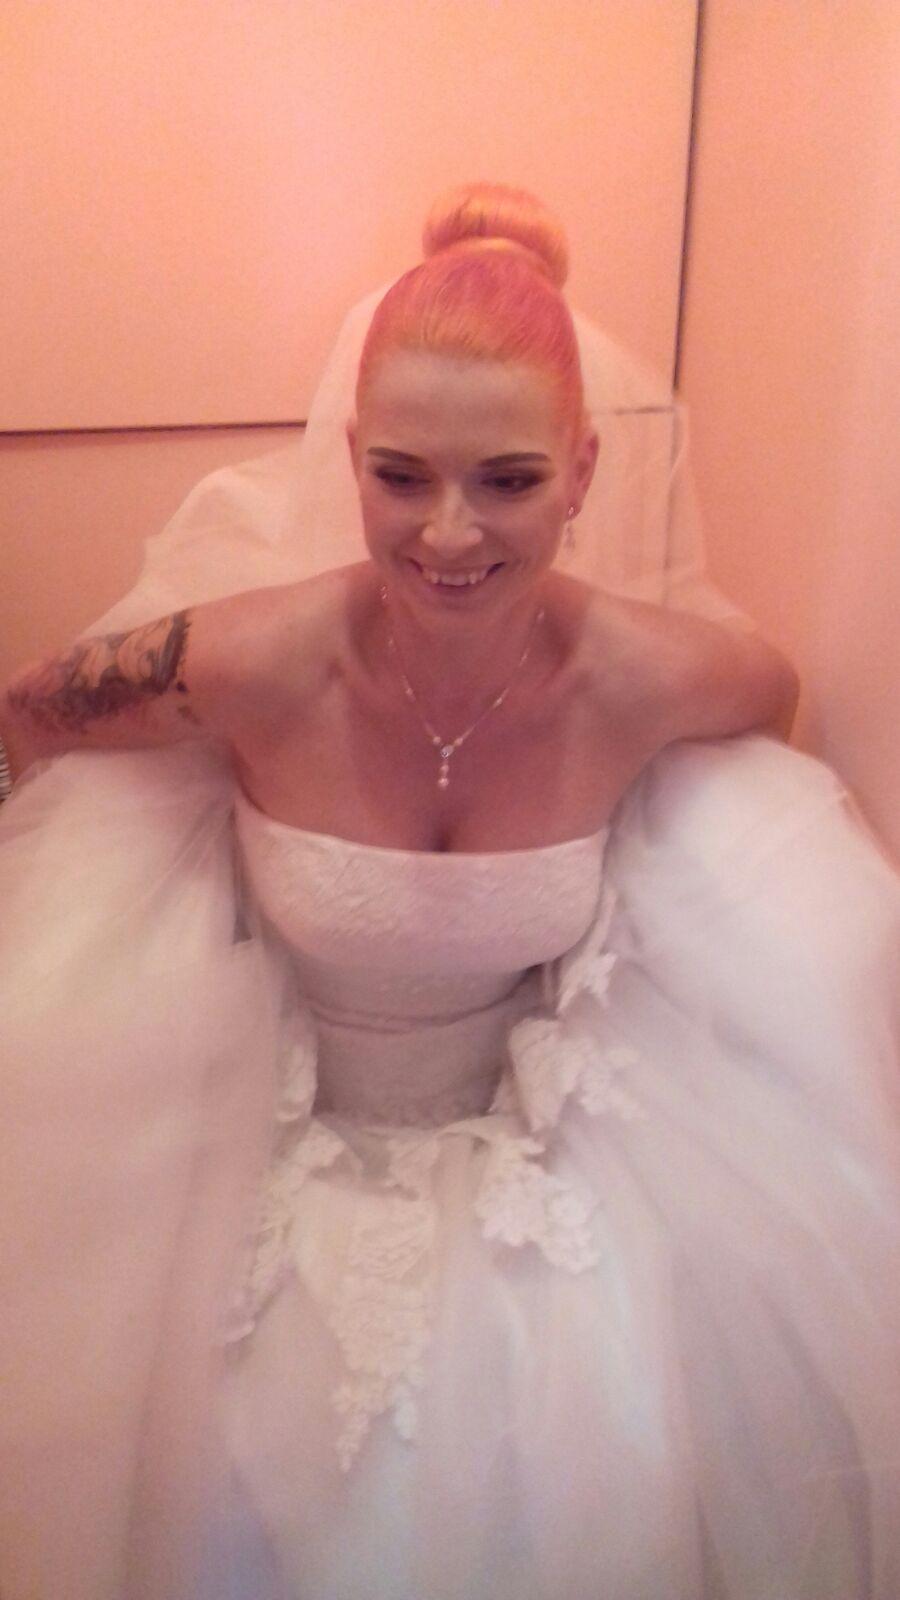 K+S moto svatba 2.9.2019 - I princezny chodì na wc :-D